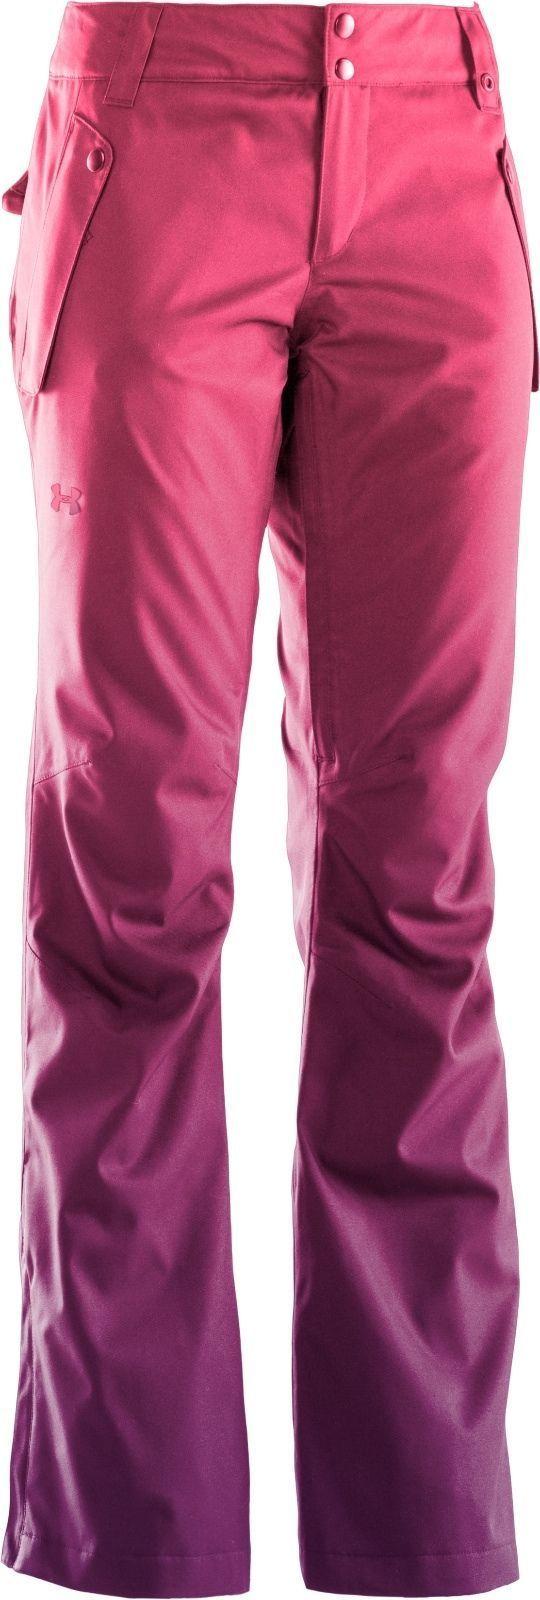 under armour winter pants